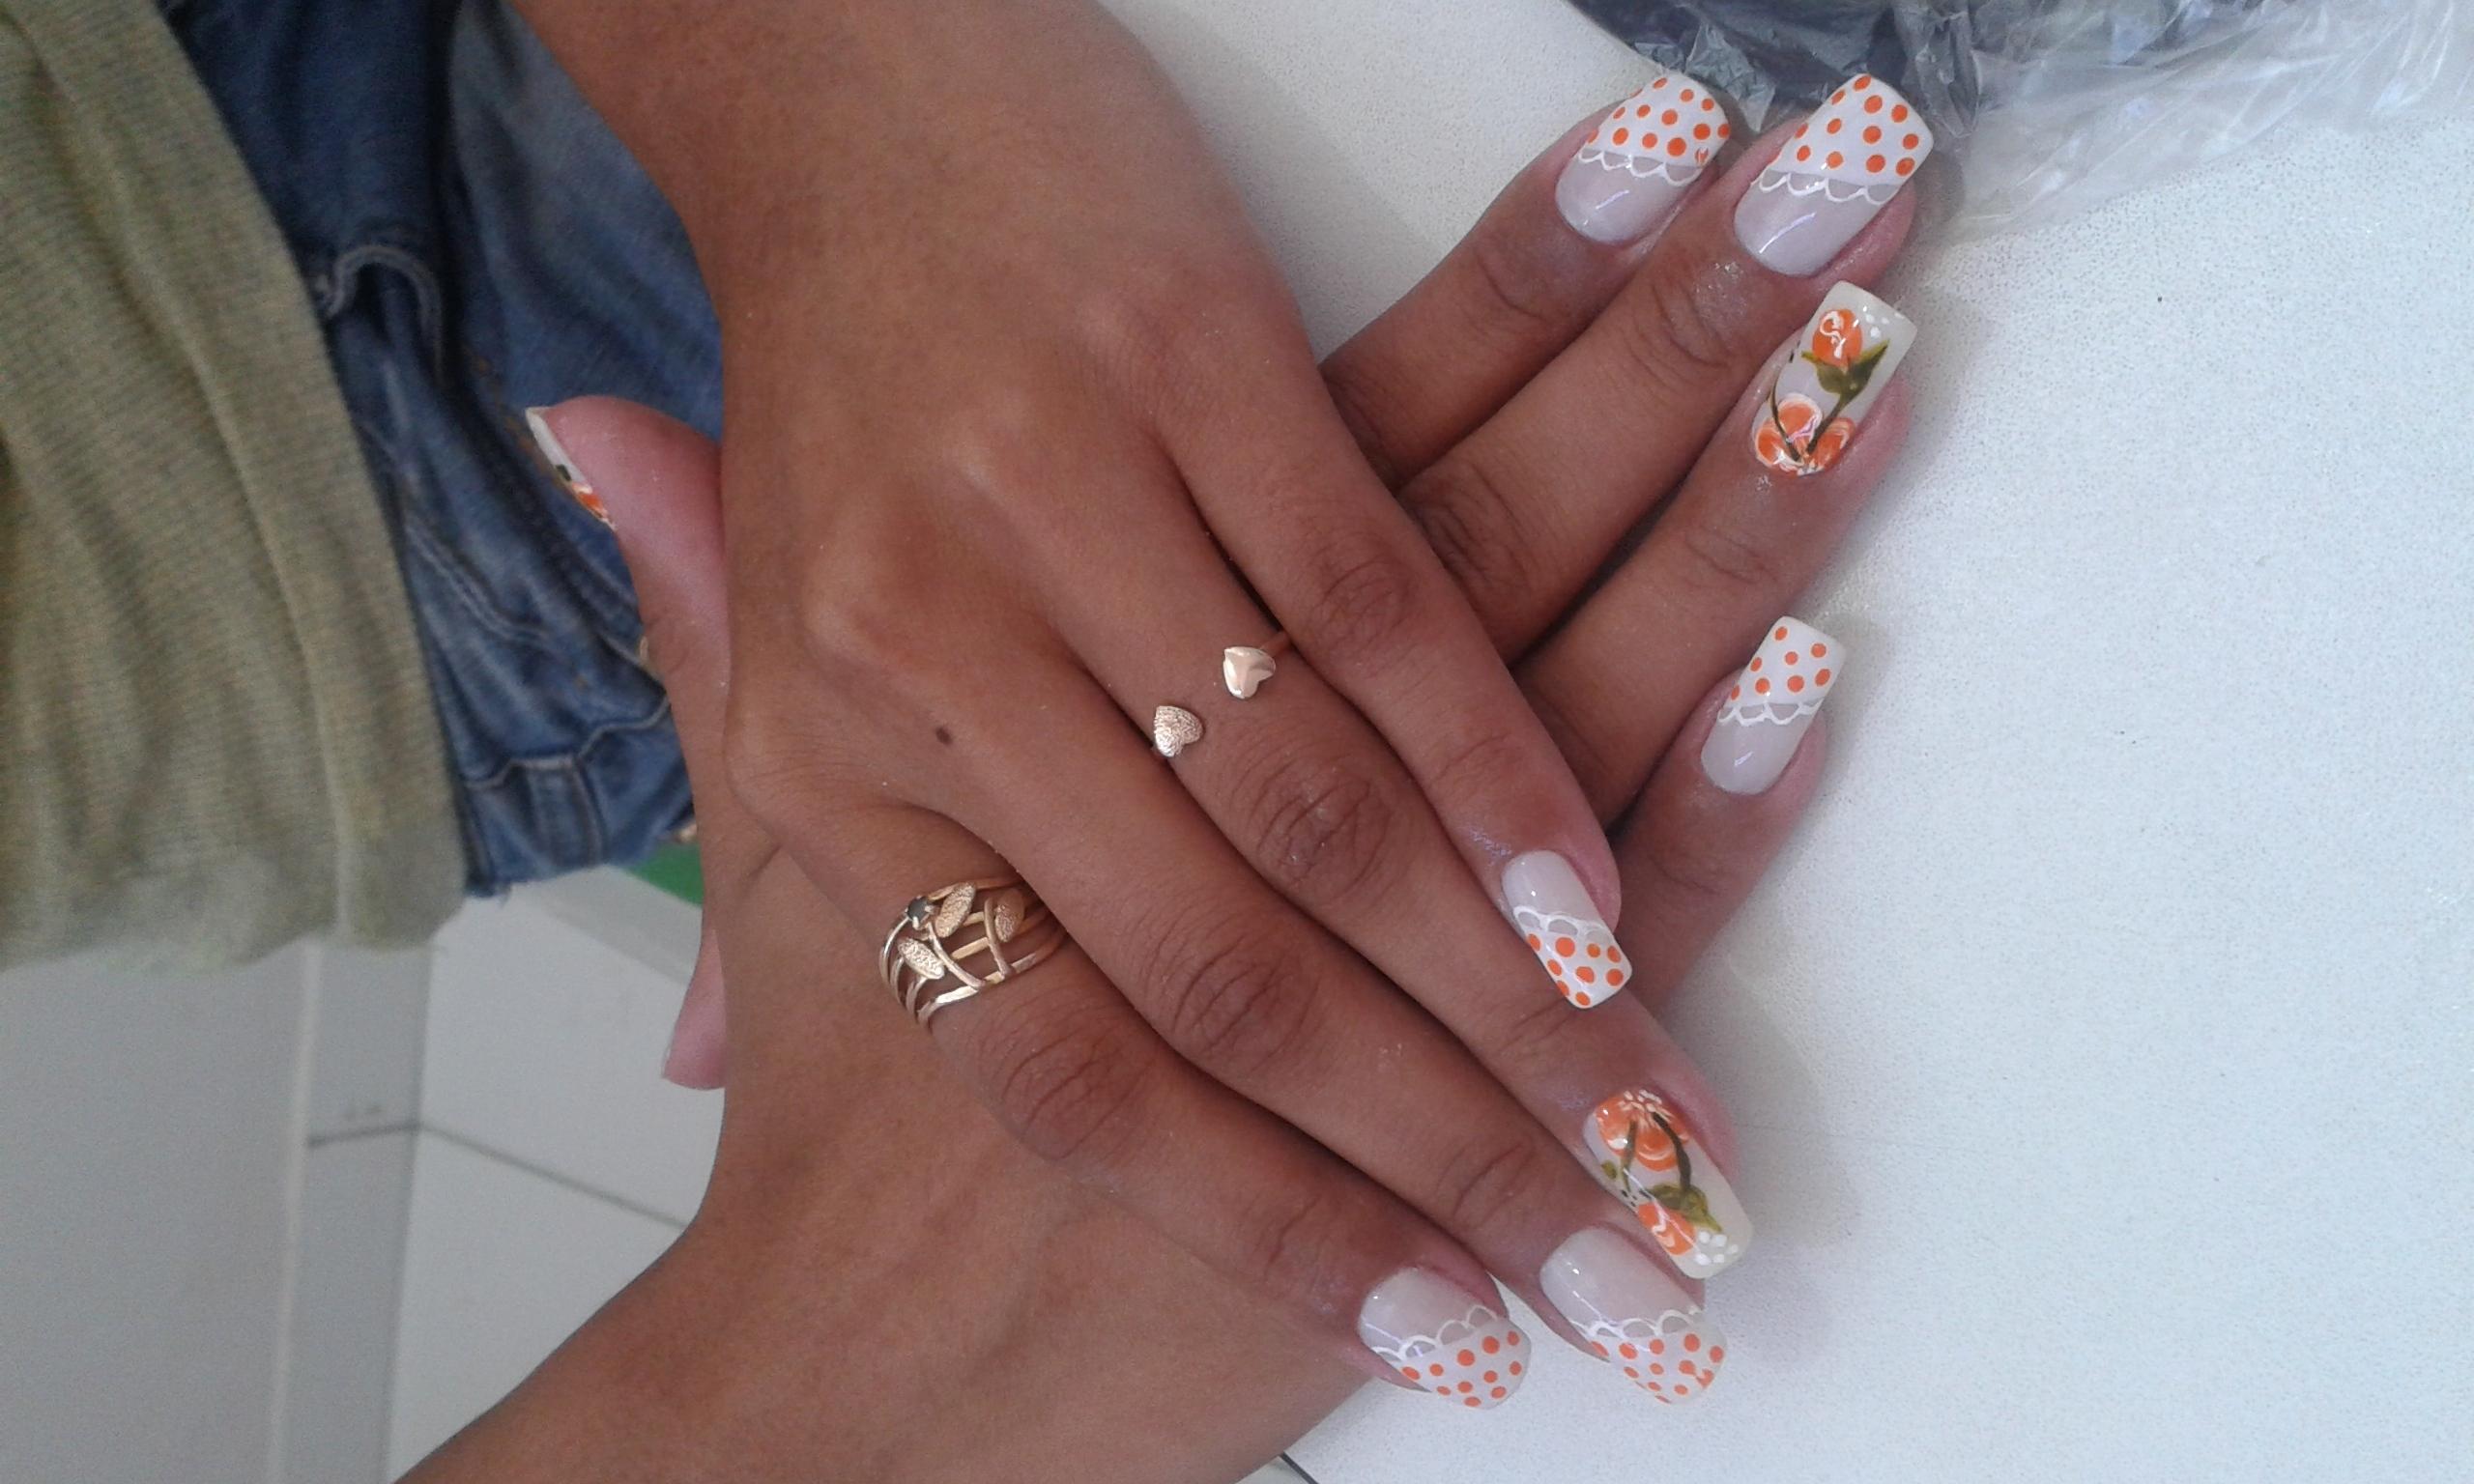 floral laranja, bolinhas, renda, festa, dia unhas  manicure e pedicure manicure e pedicure